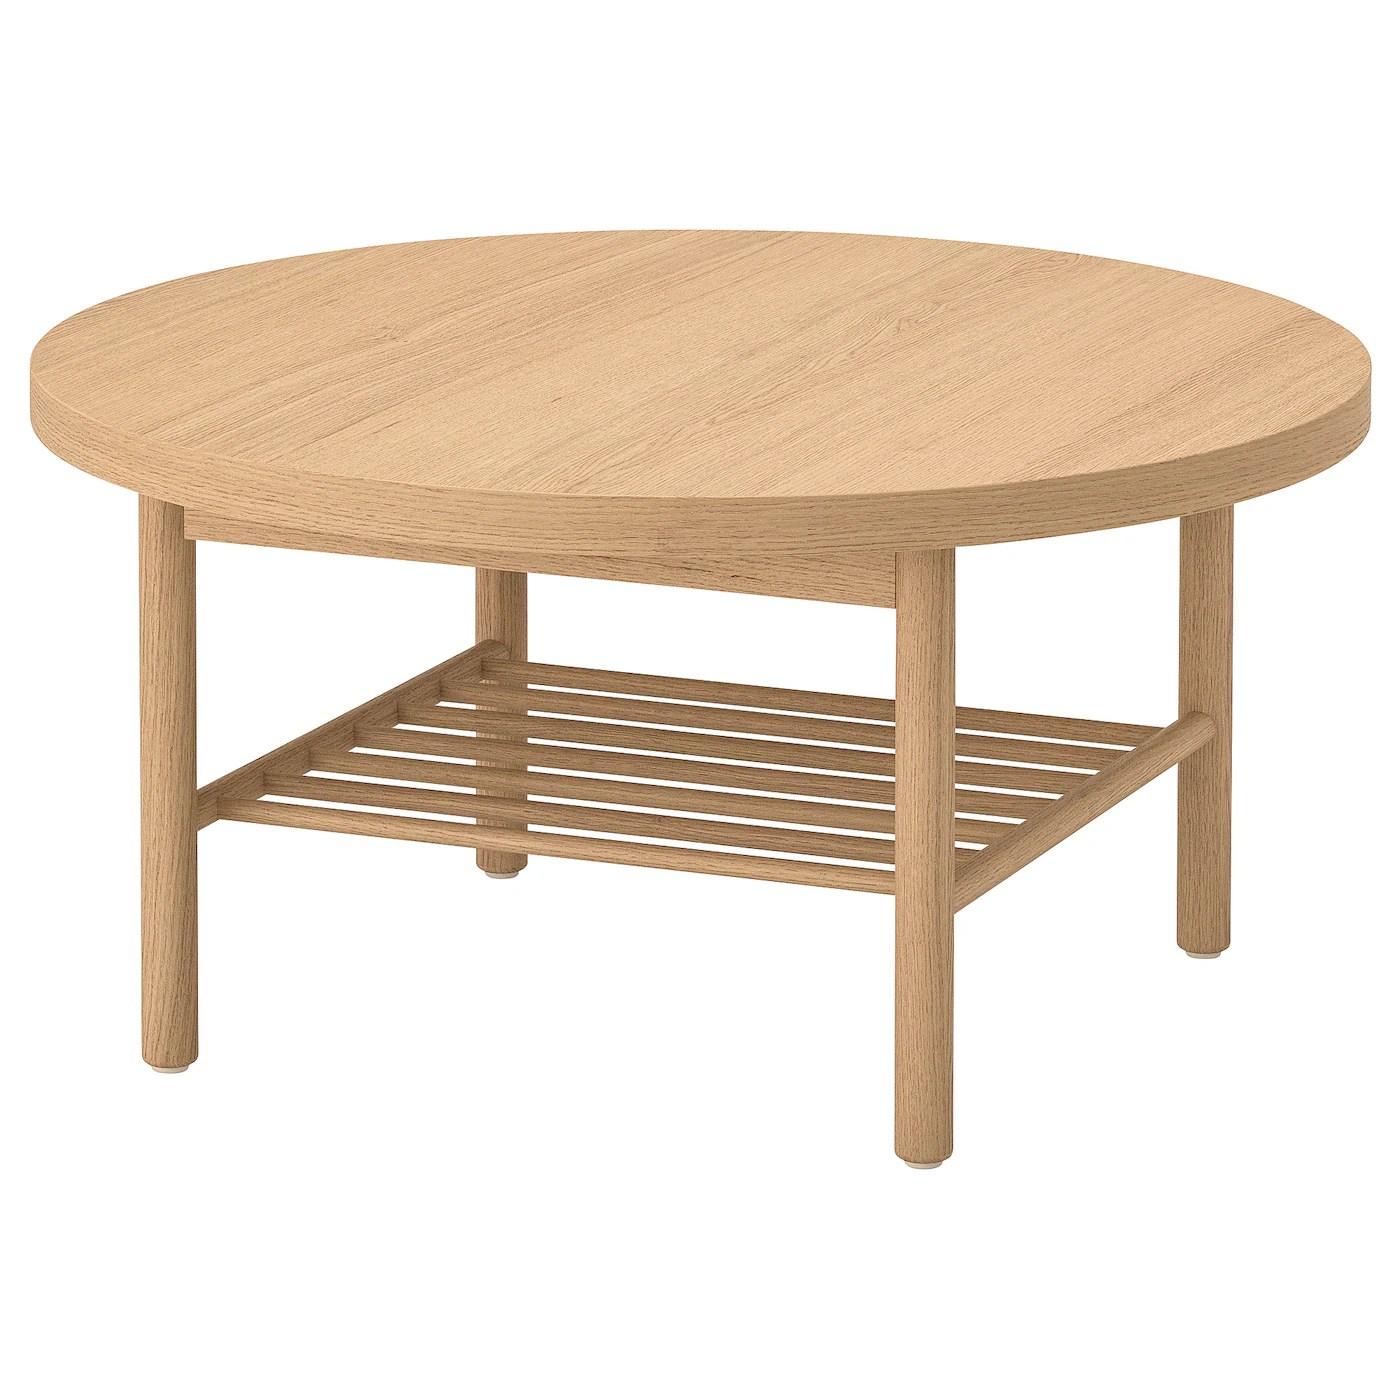 Listerby Table Basse Teinte Blanc Chene 90 Cm Ikea